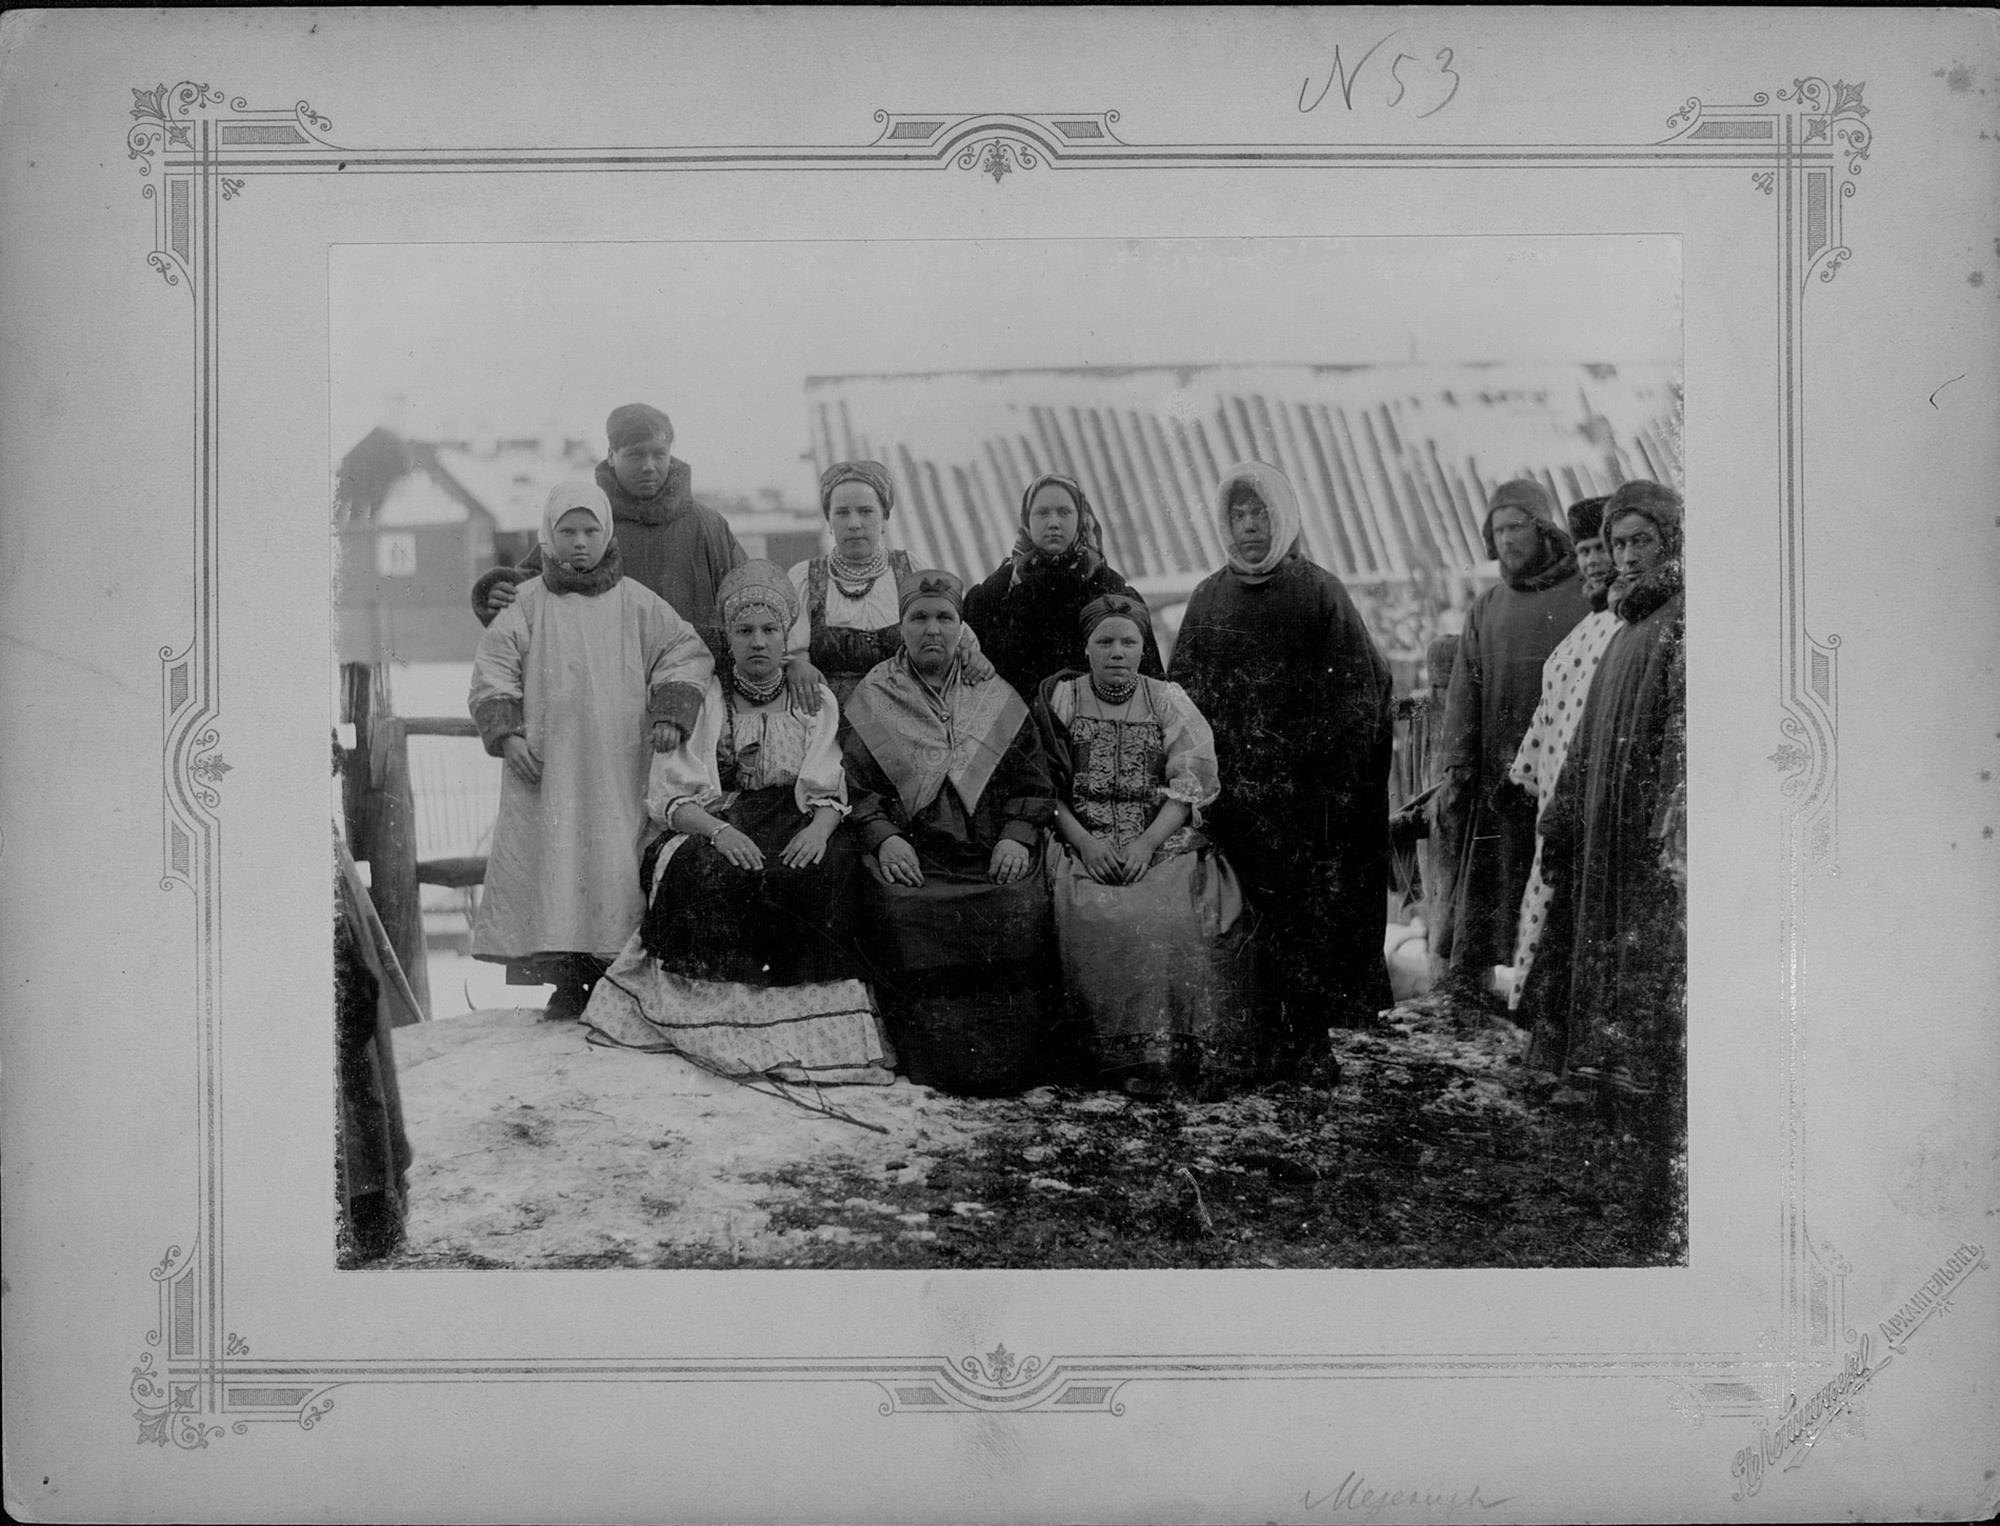 053. Мезенские крестьяне